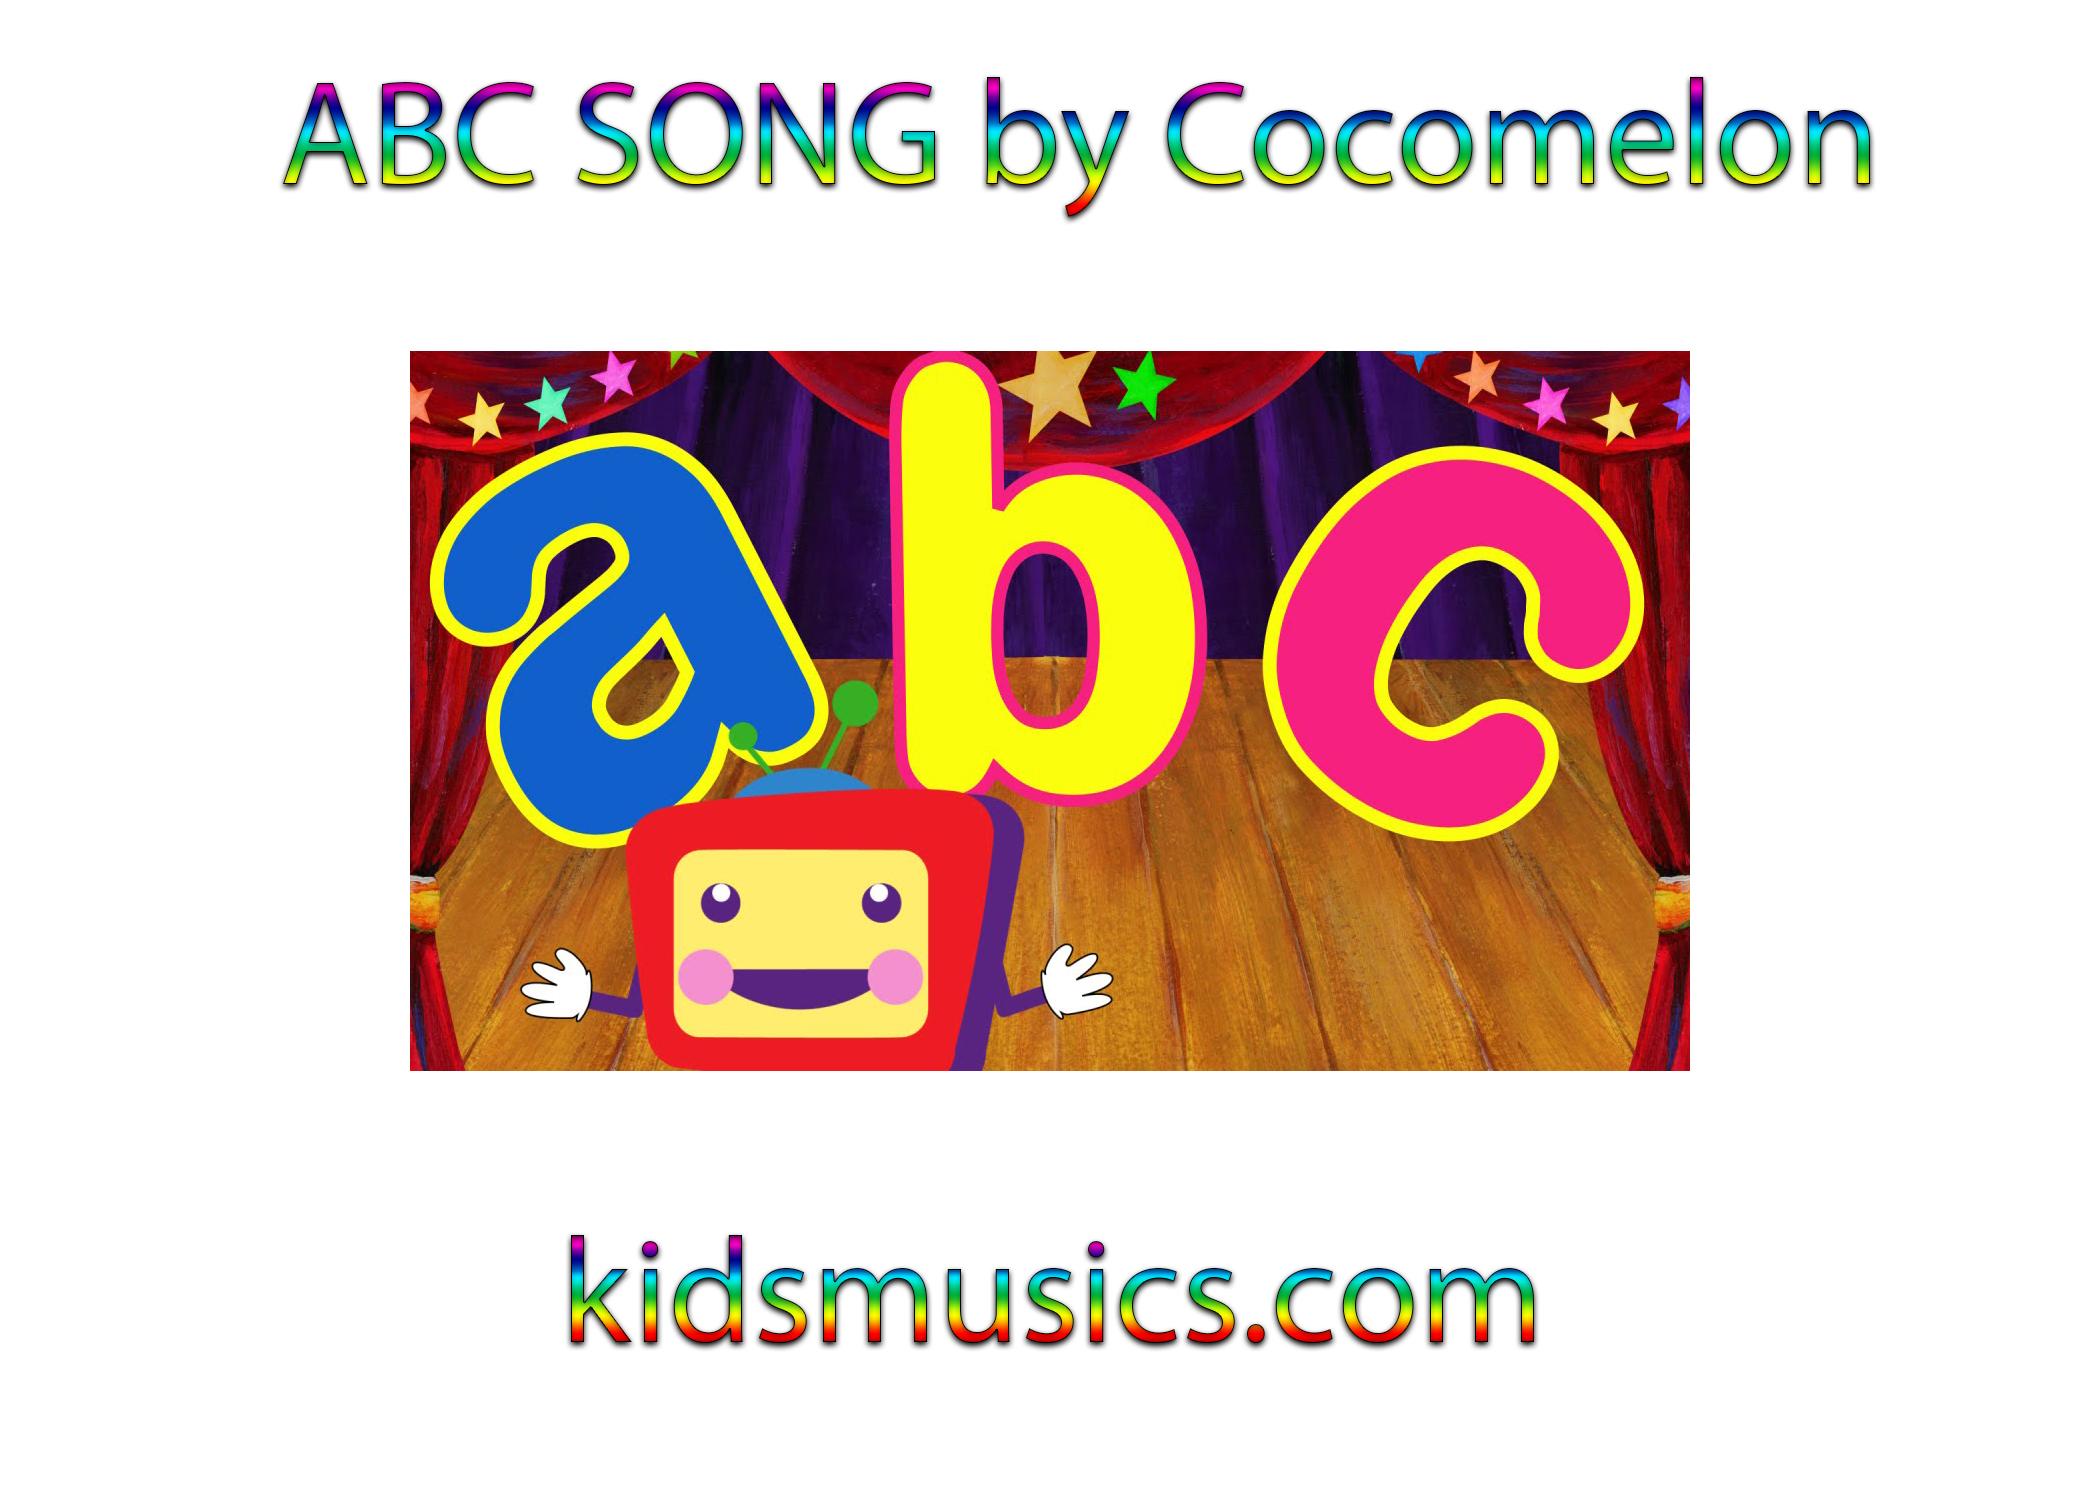 Kidsmusics Abc Song By Cocomelon Free Download Mp4 Video 720p Mp3 Pdf Lyrics Kids Music